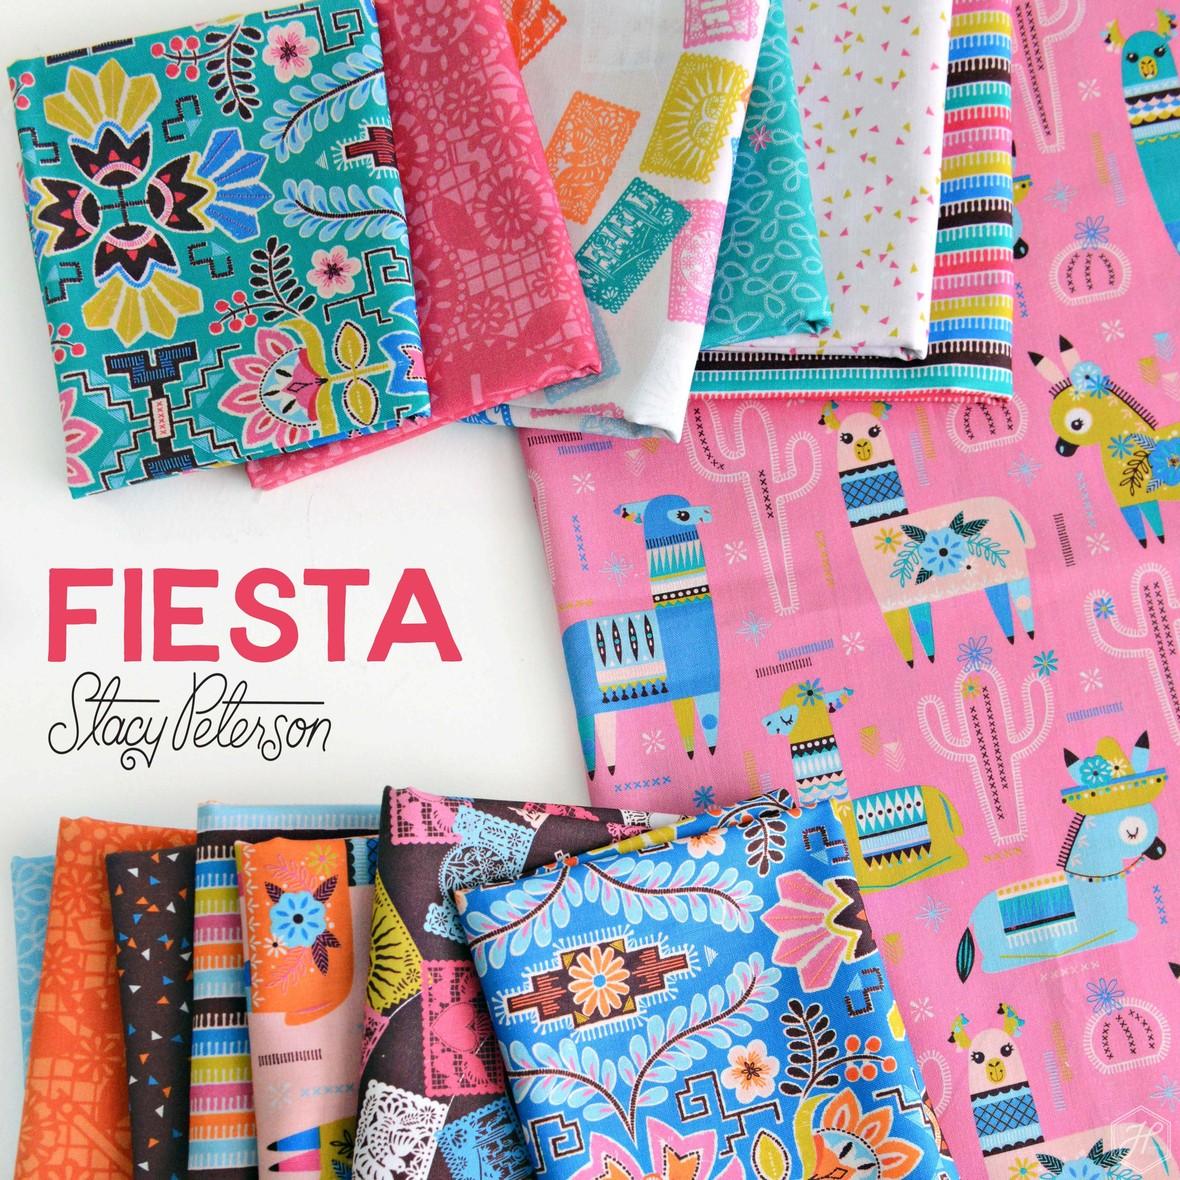 Fiesta Fabric Poster